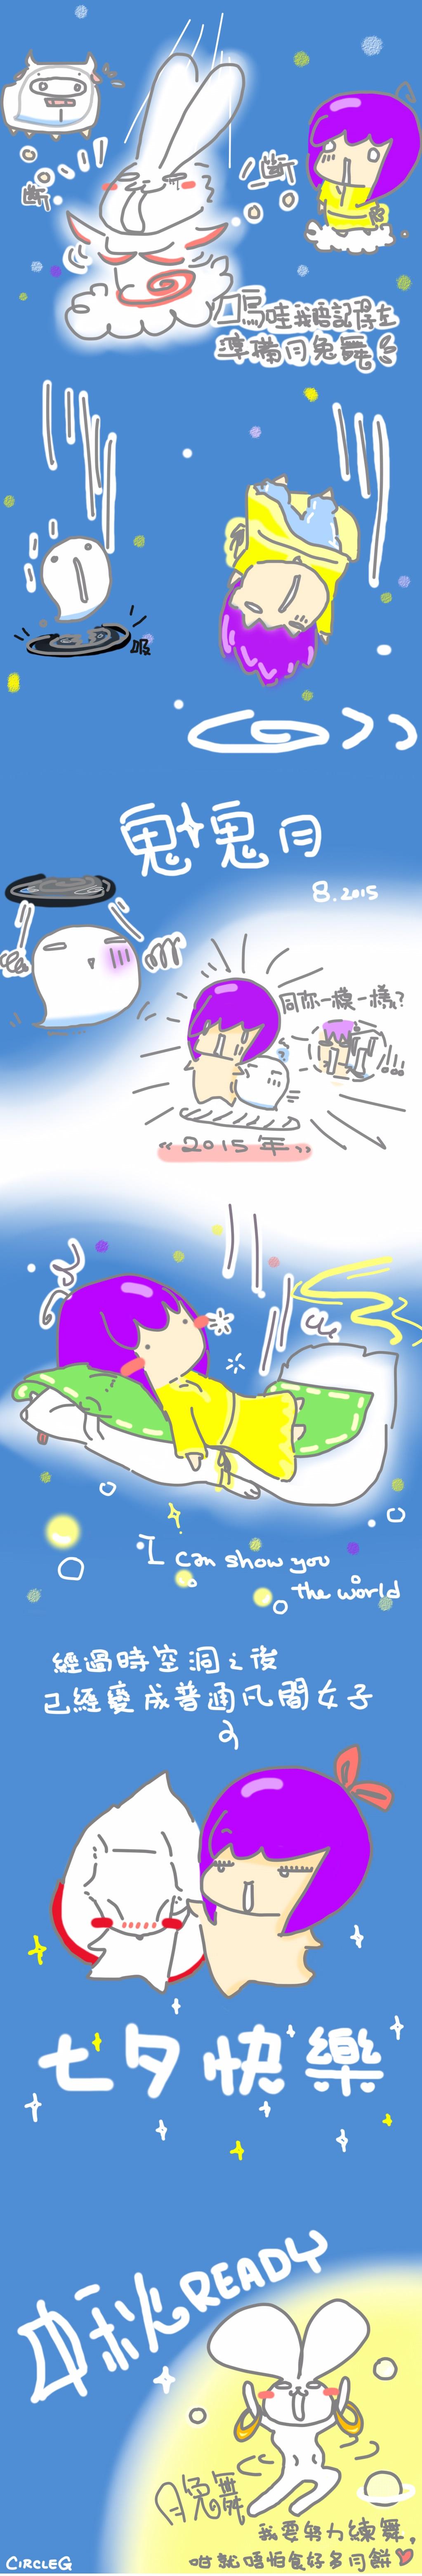 CUTTED 02 CIRCLEG 鬼月 七夕 中秋 快樂 圖文 短篇 漫畫